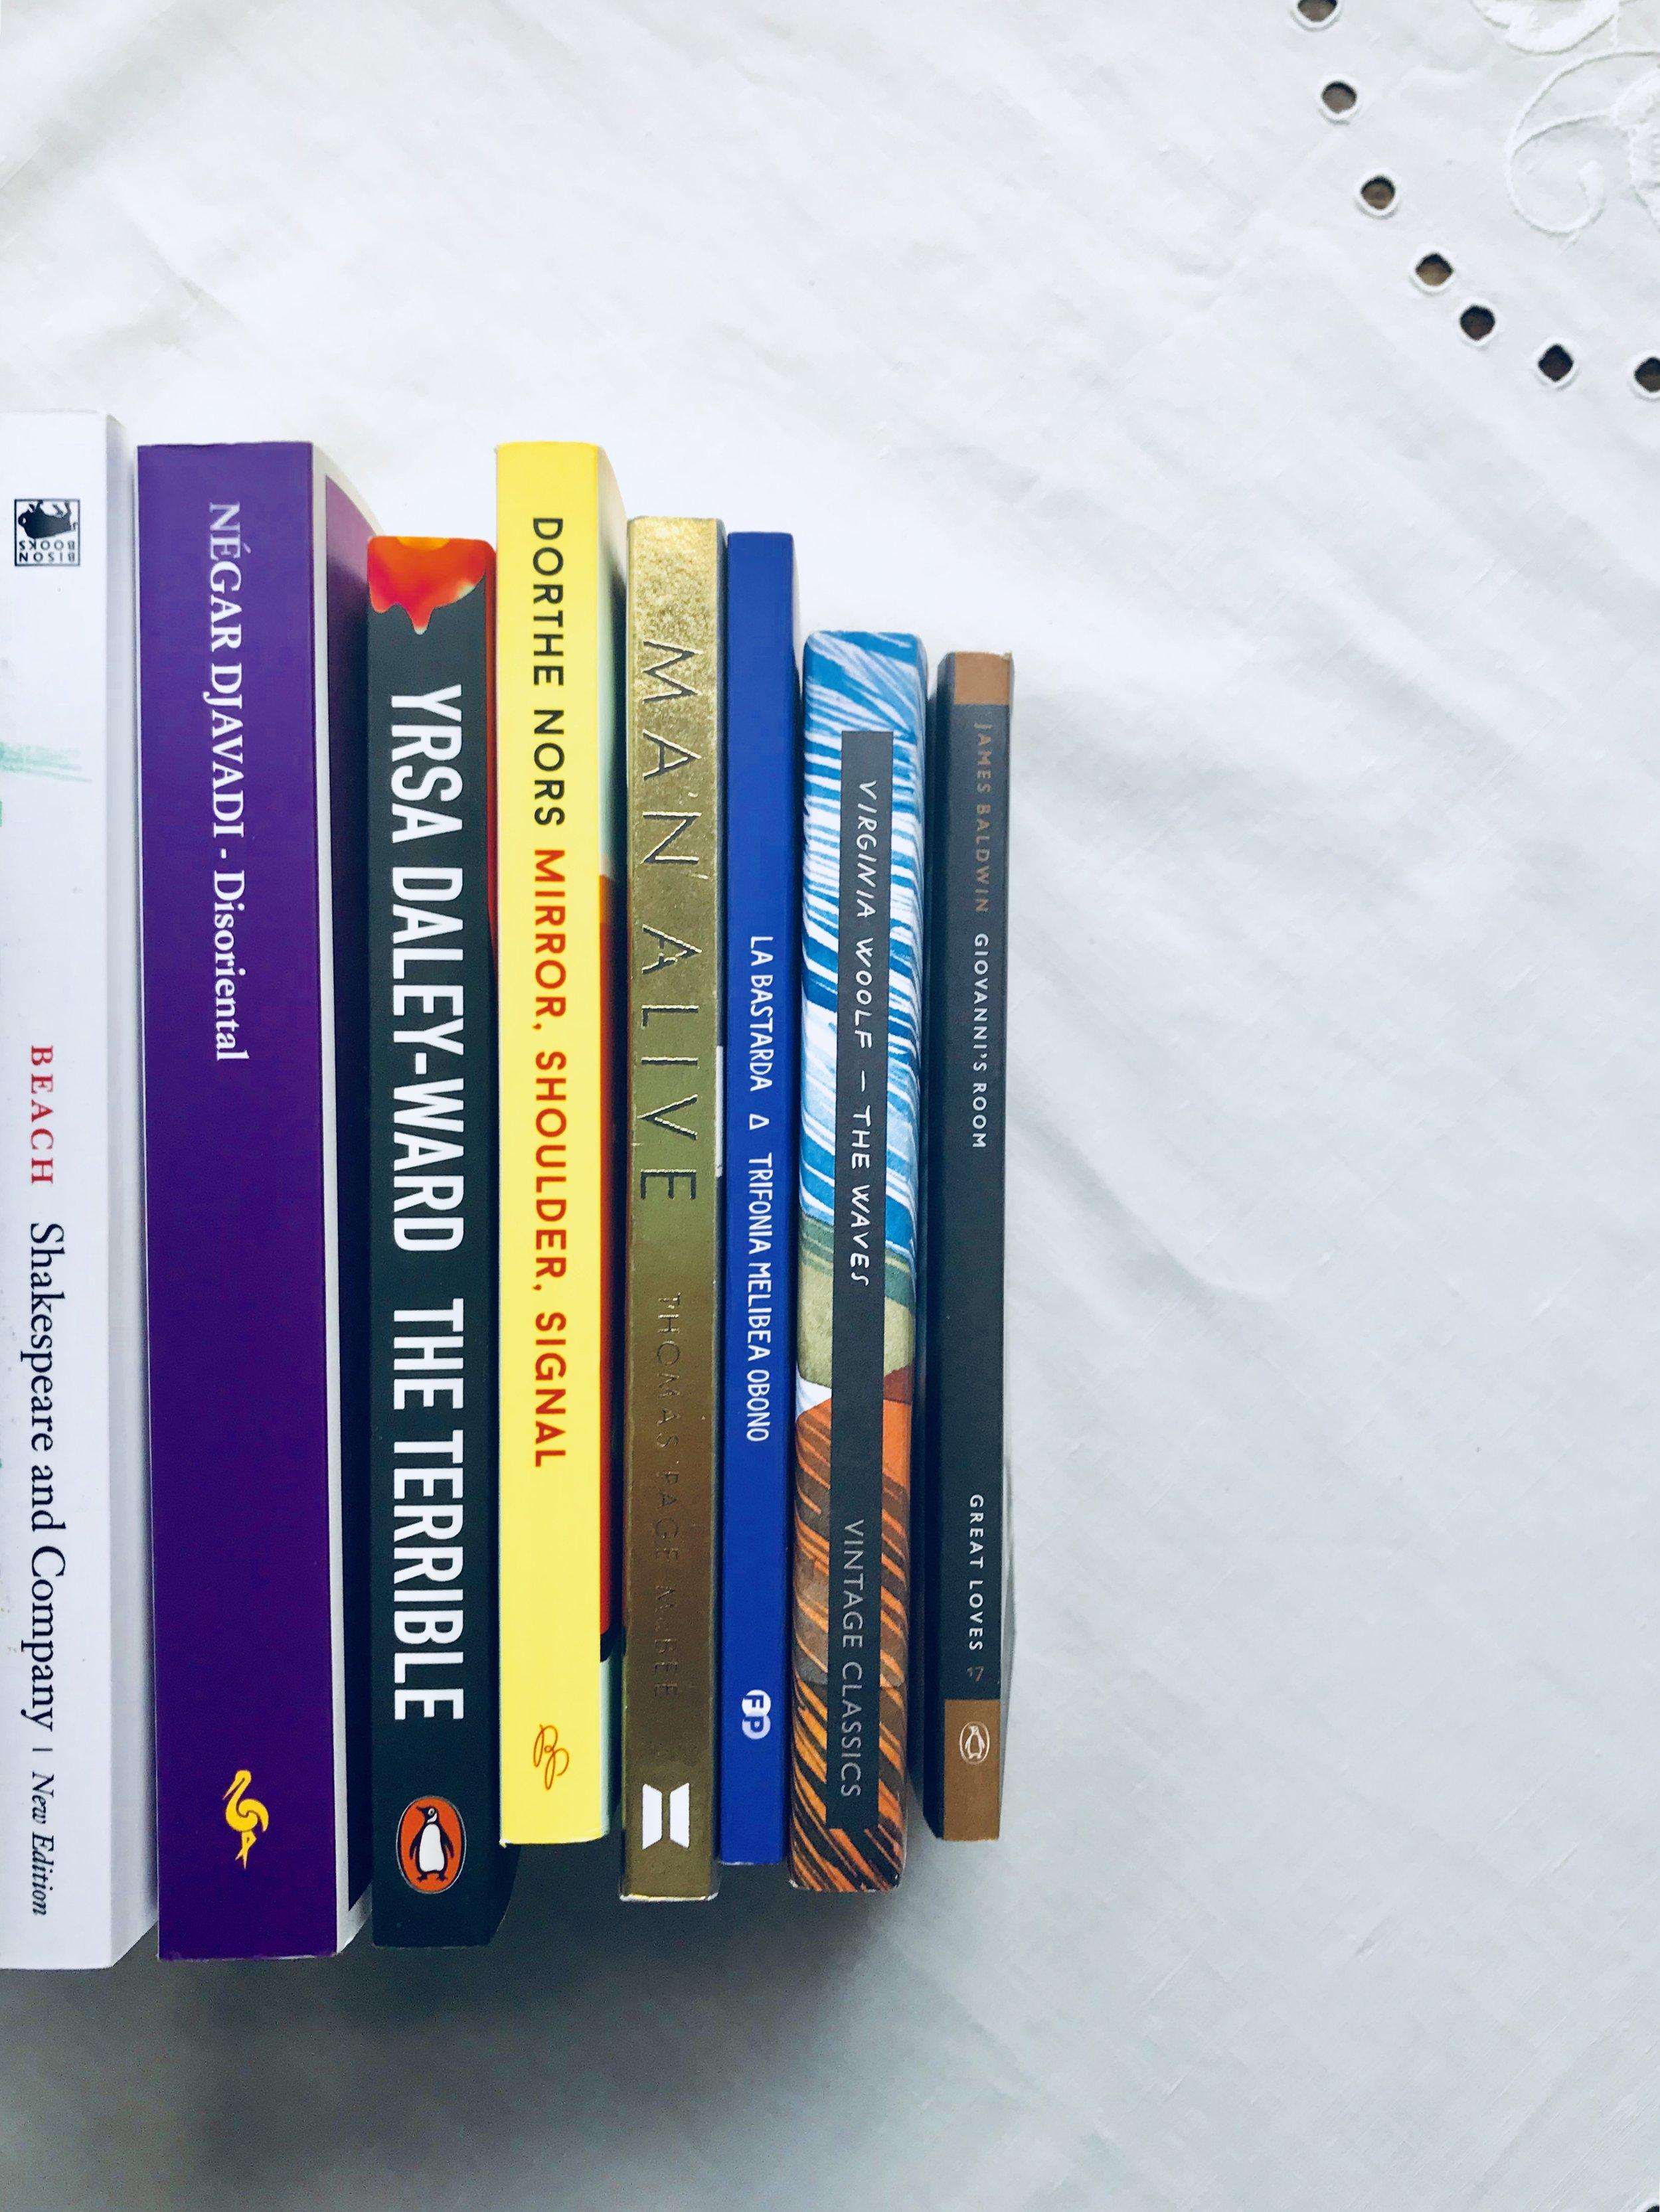 Book haul spines.jpg